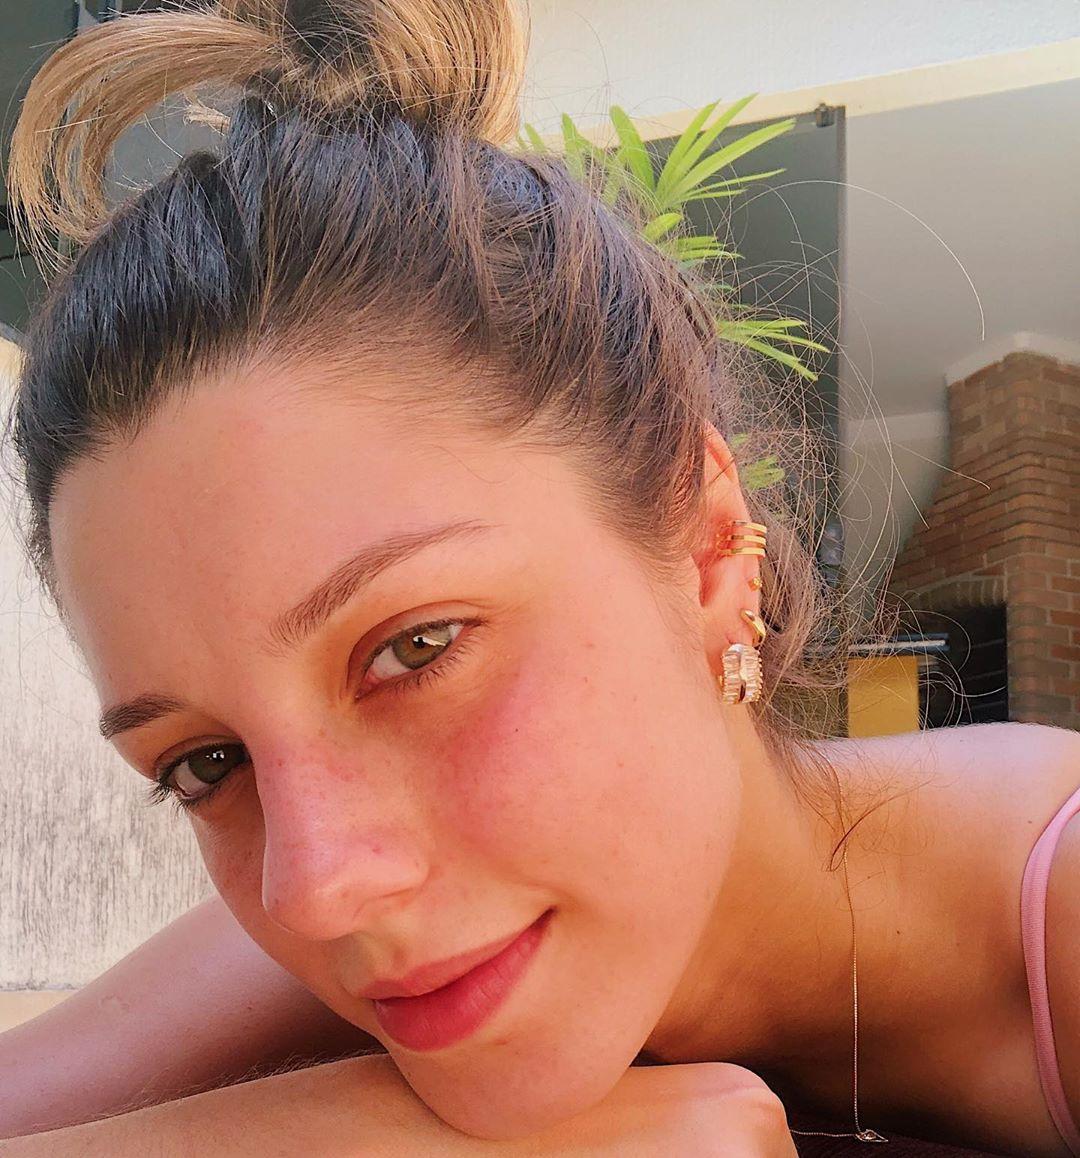 isabela stella, miss arapongas 2017/2019. (renunciou ao miss parana 2020). - Página 2 73407317